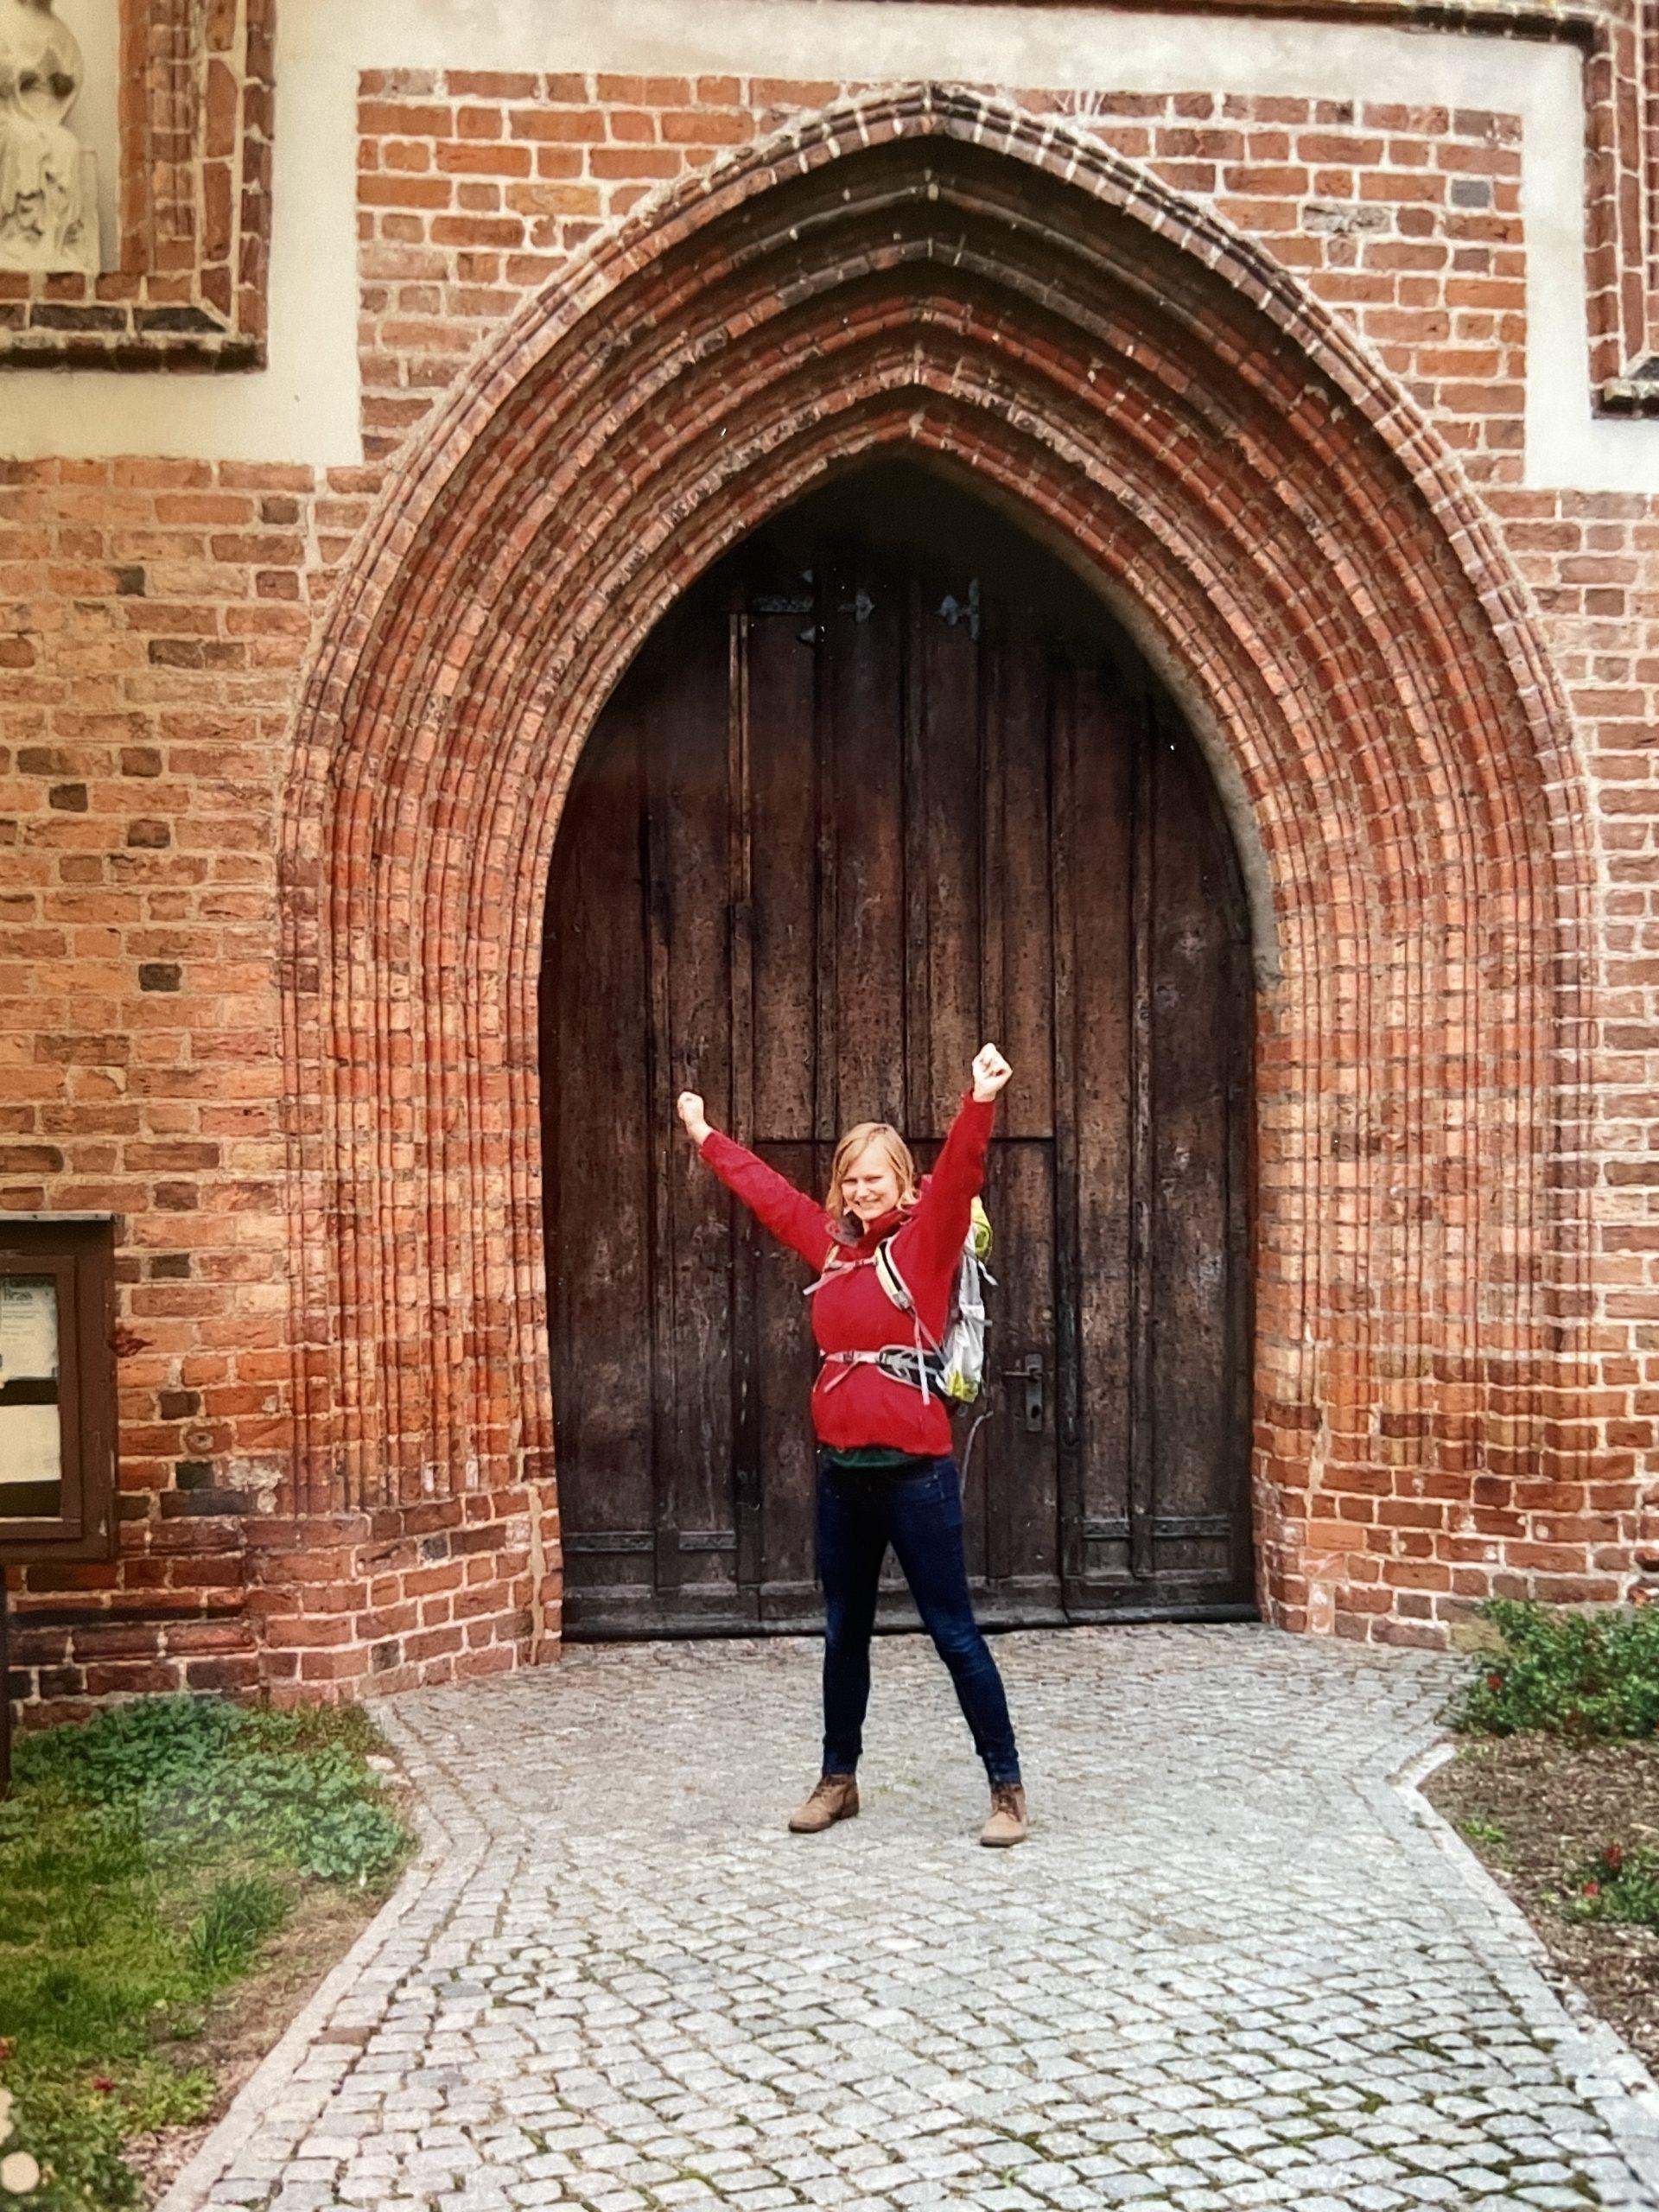 Angekommen in Bad Wilsnack - Marie am Ende des Pilger-Weges